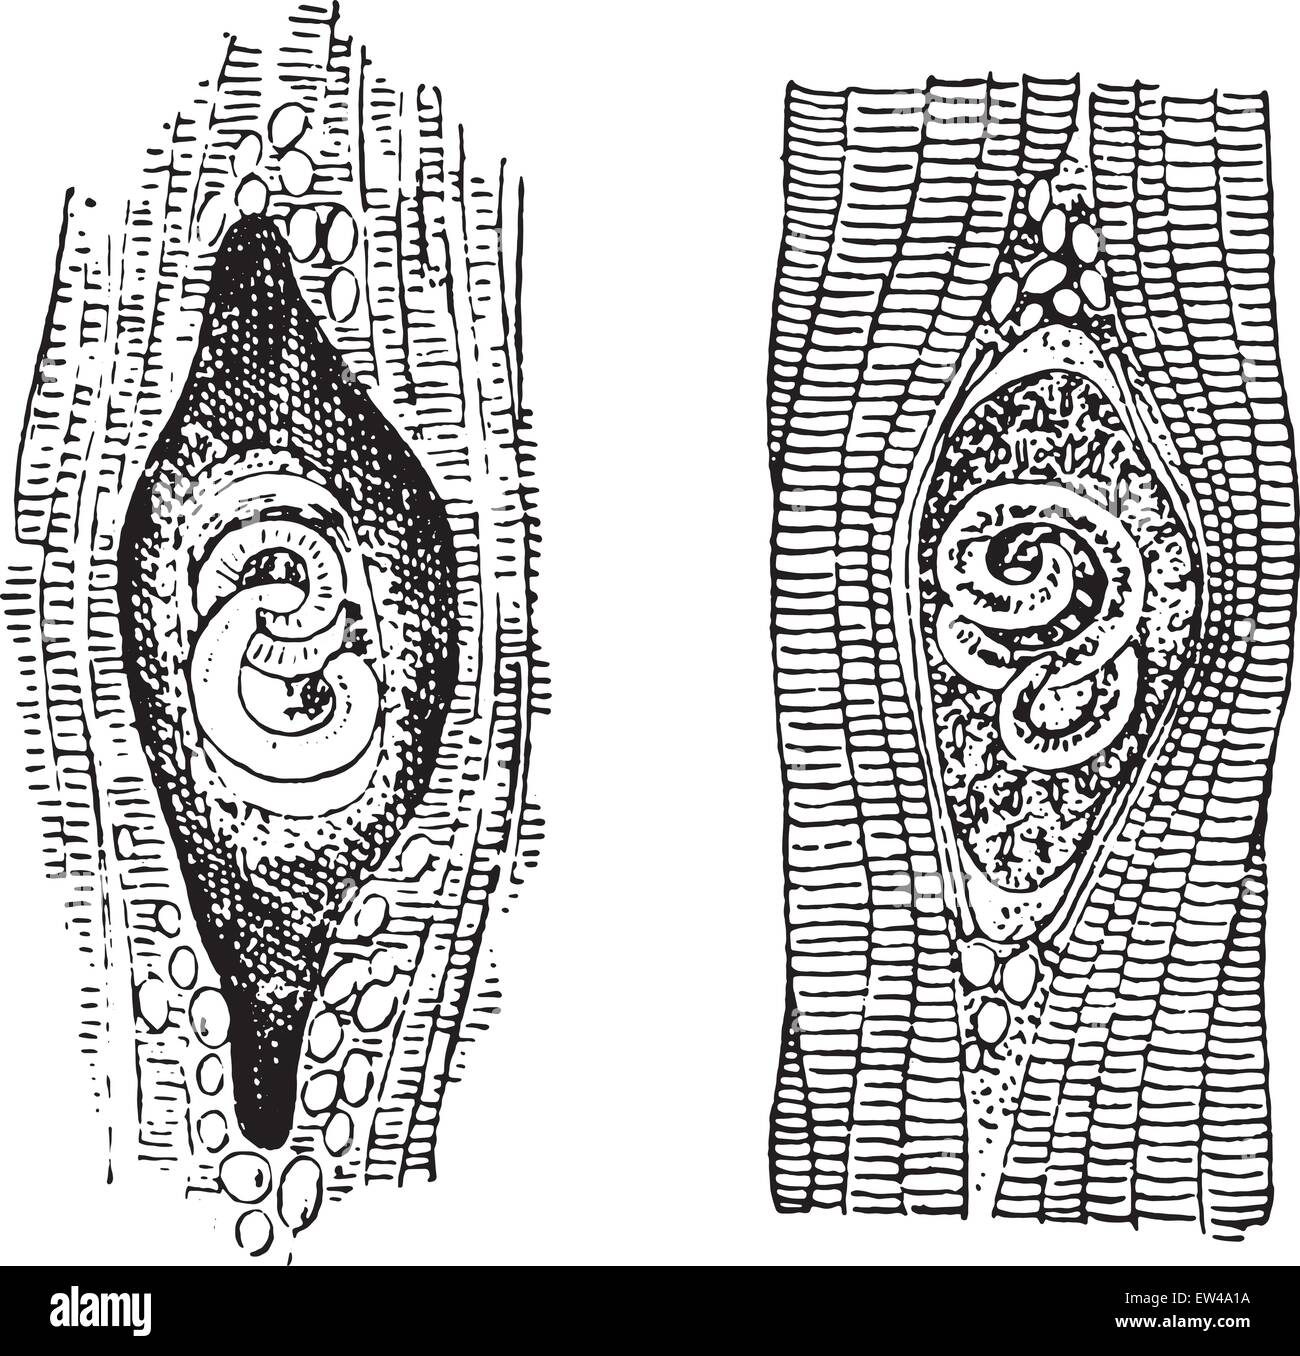 hight resolution of trichina spiralis vintage engraved illustration stock image